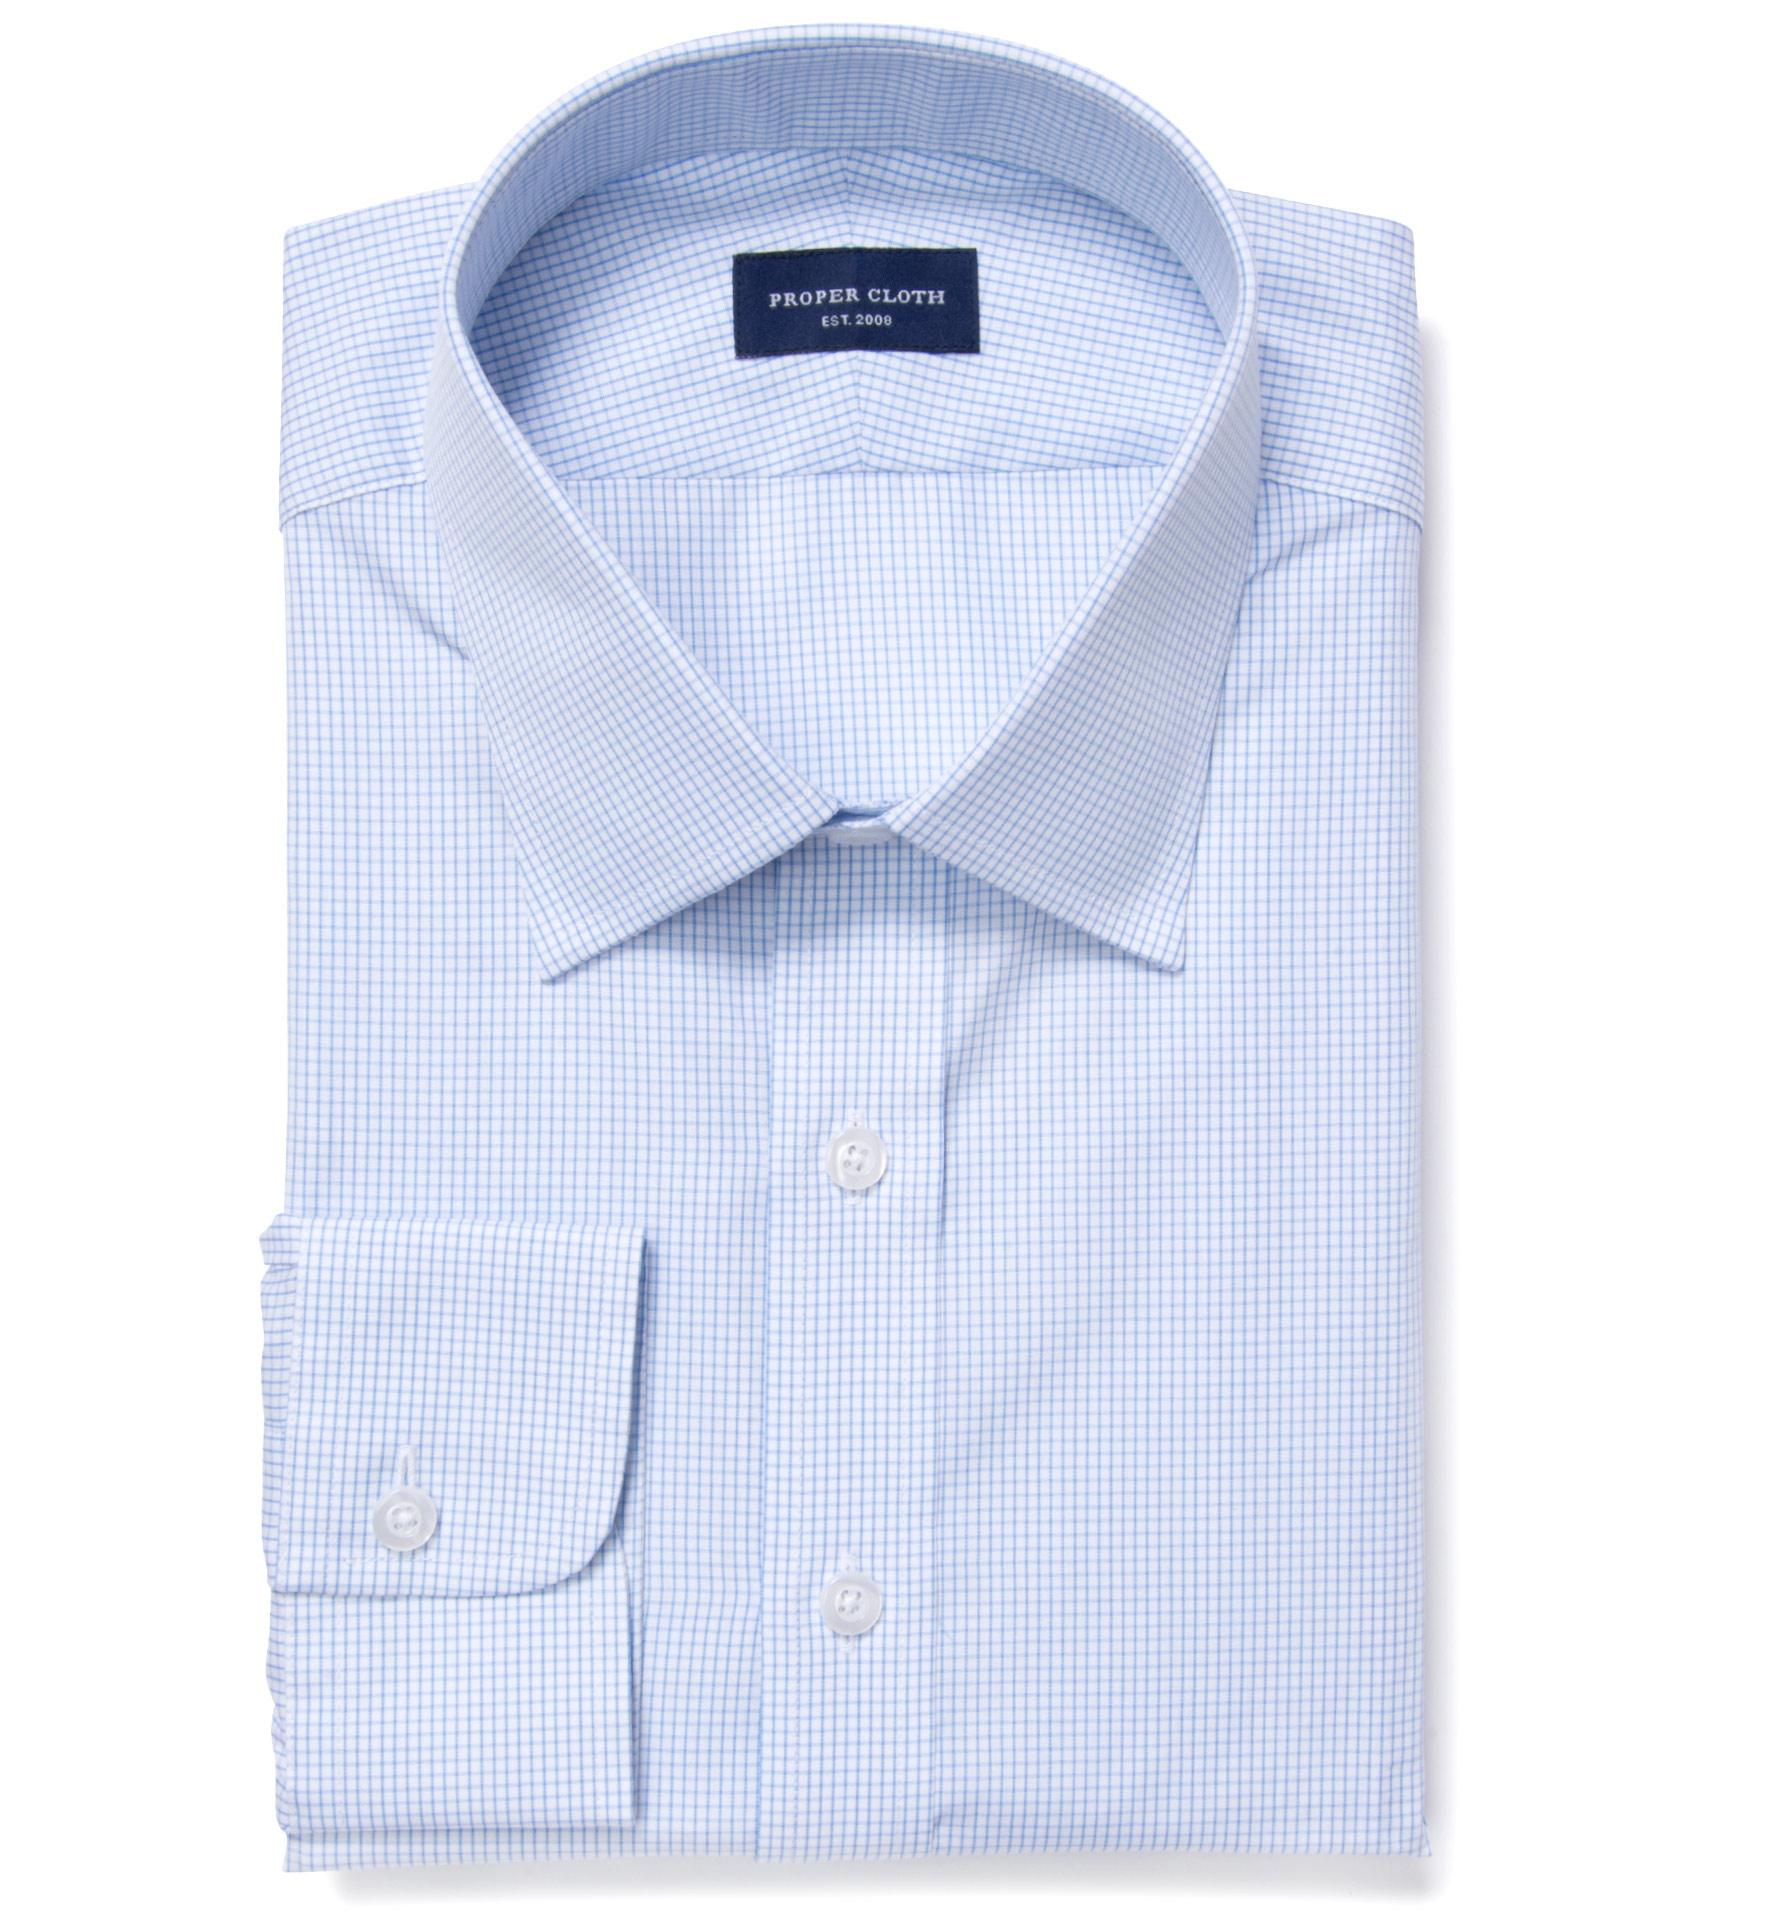 Thomas Mason Light Blue Small Grid Fitted Shirt By Proper